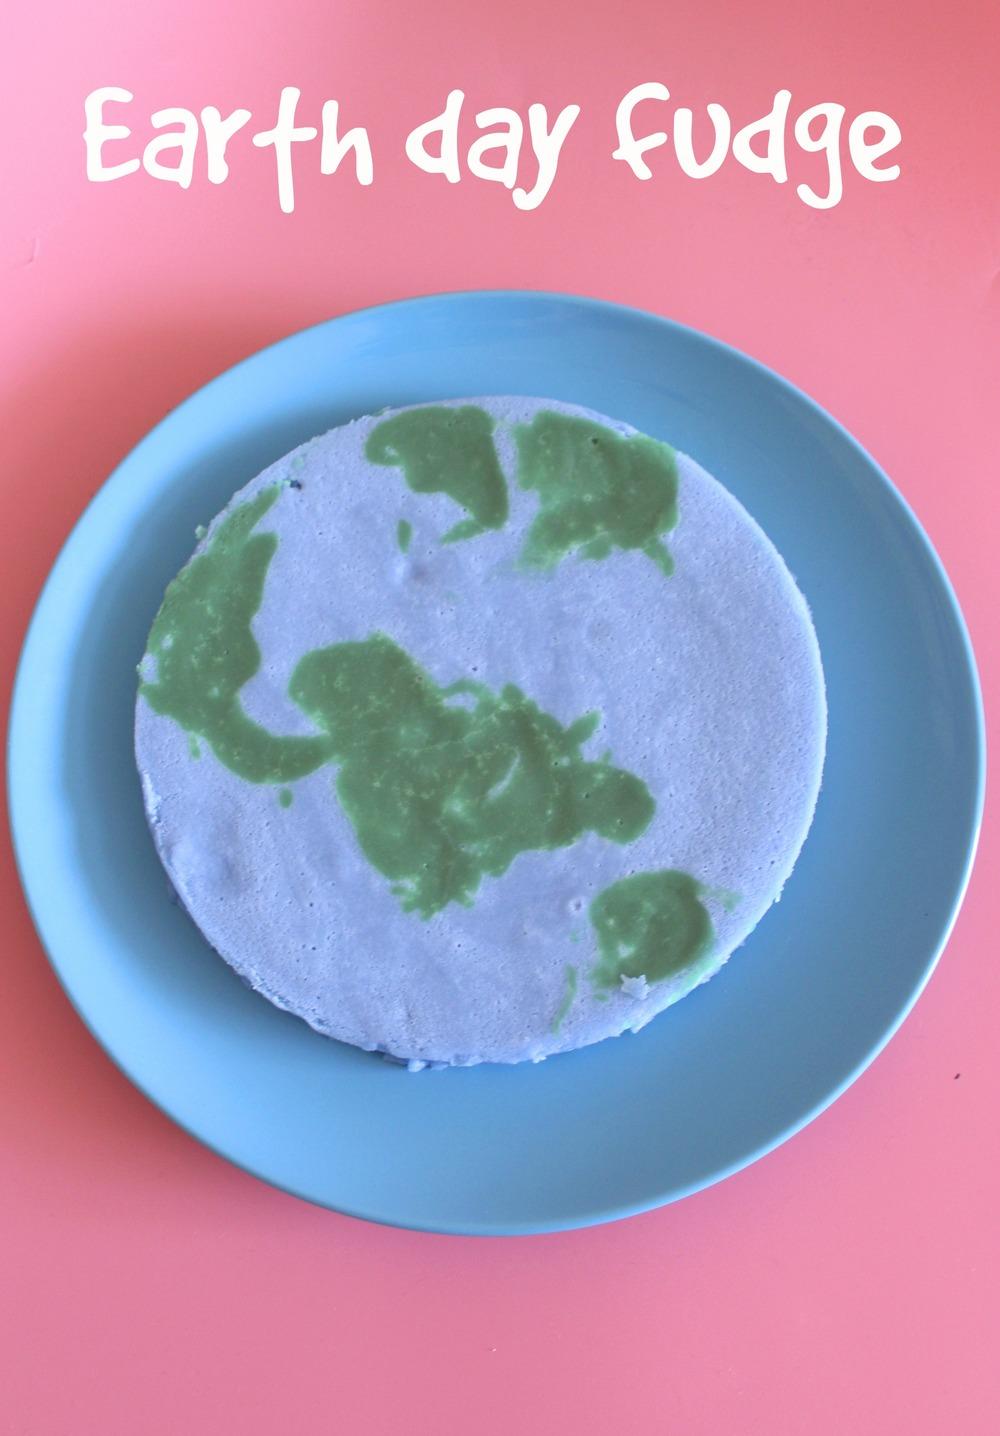 Earth day fudge